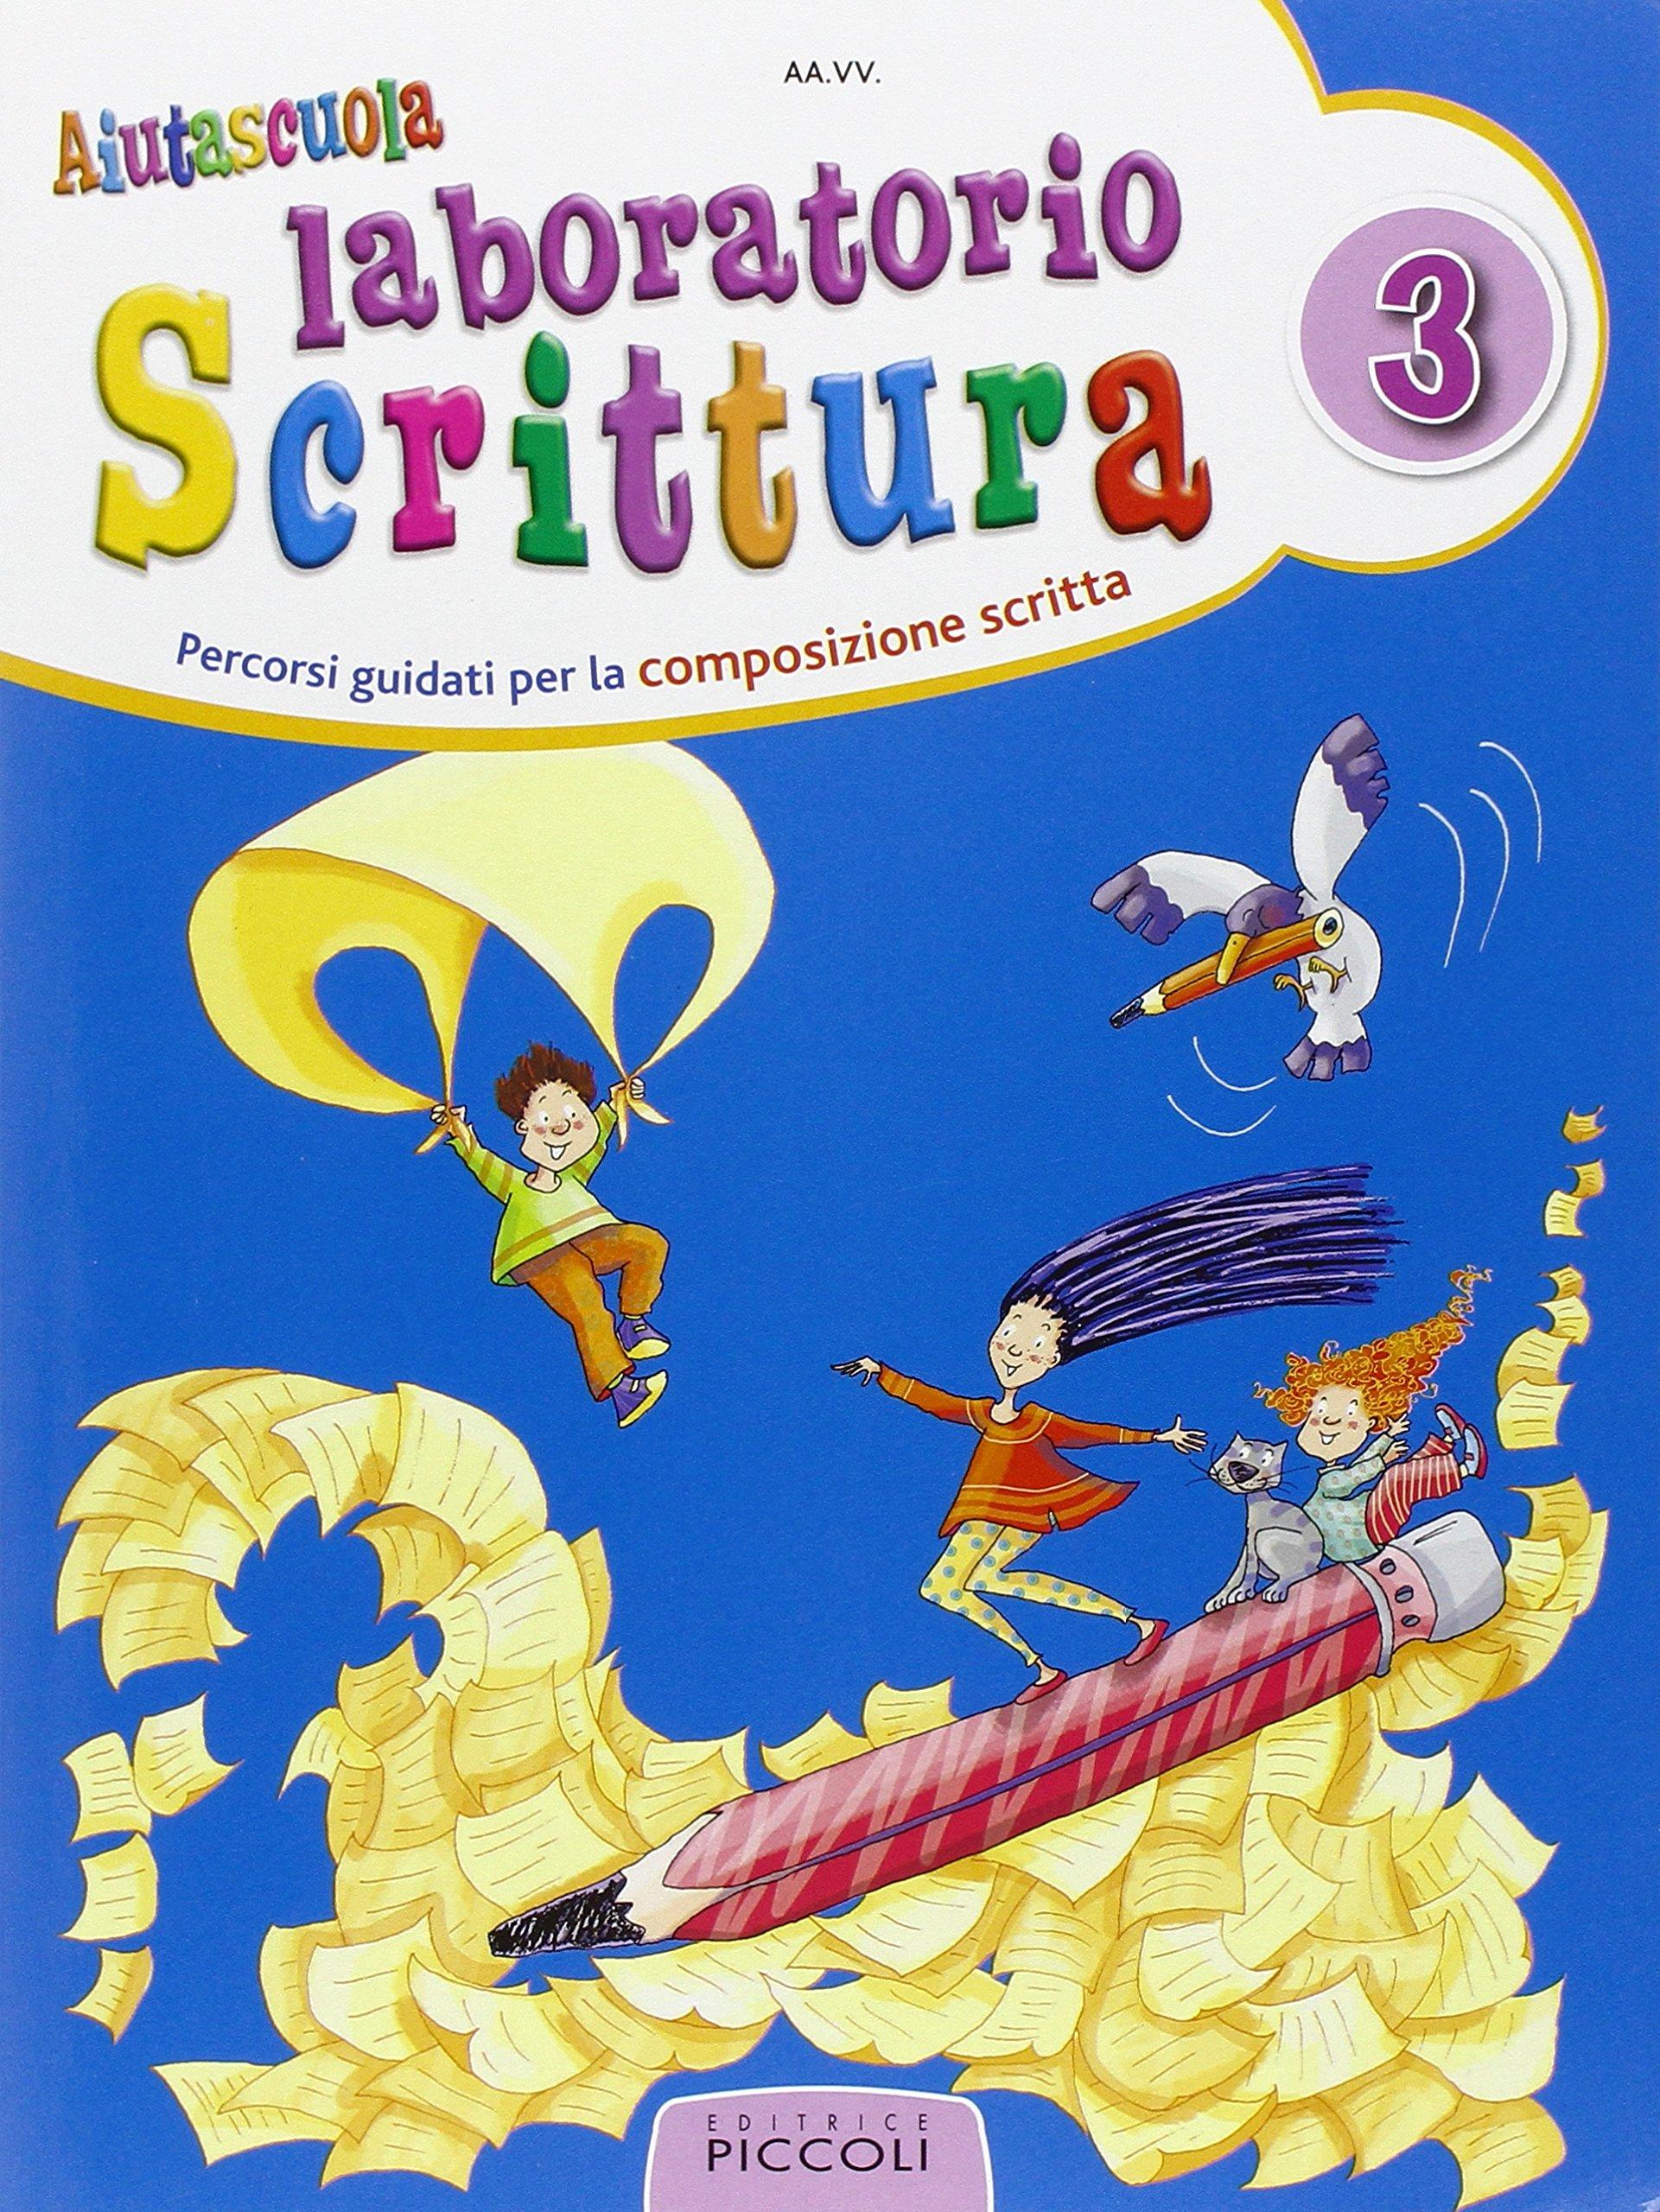 Eccezionale Scrittura Creativa Scuola Primaria VB45 » Regardsdefemmes EA64